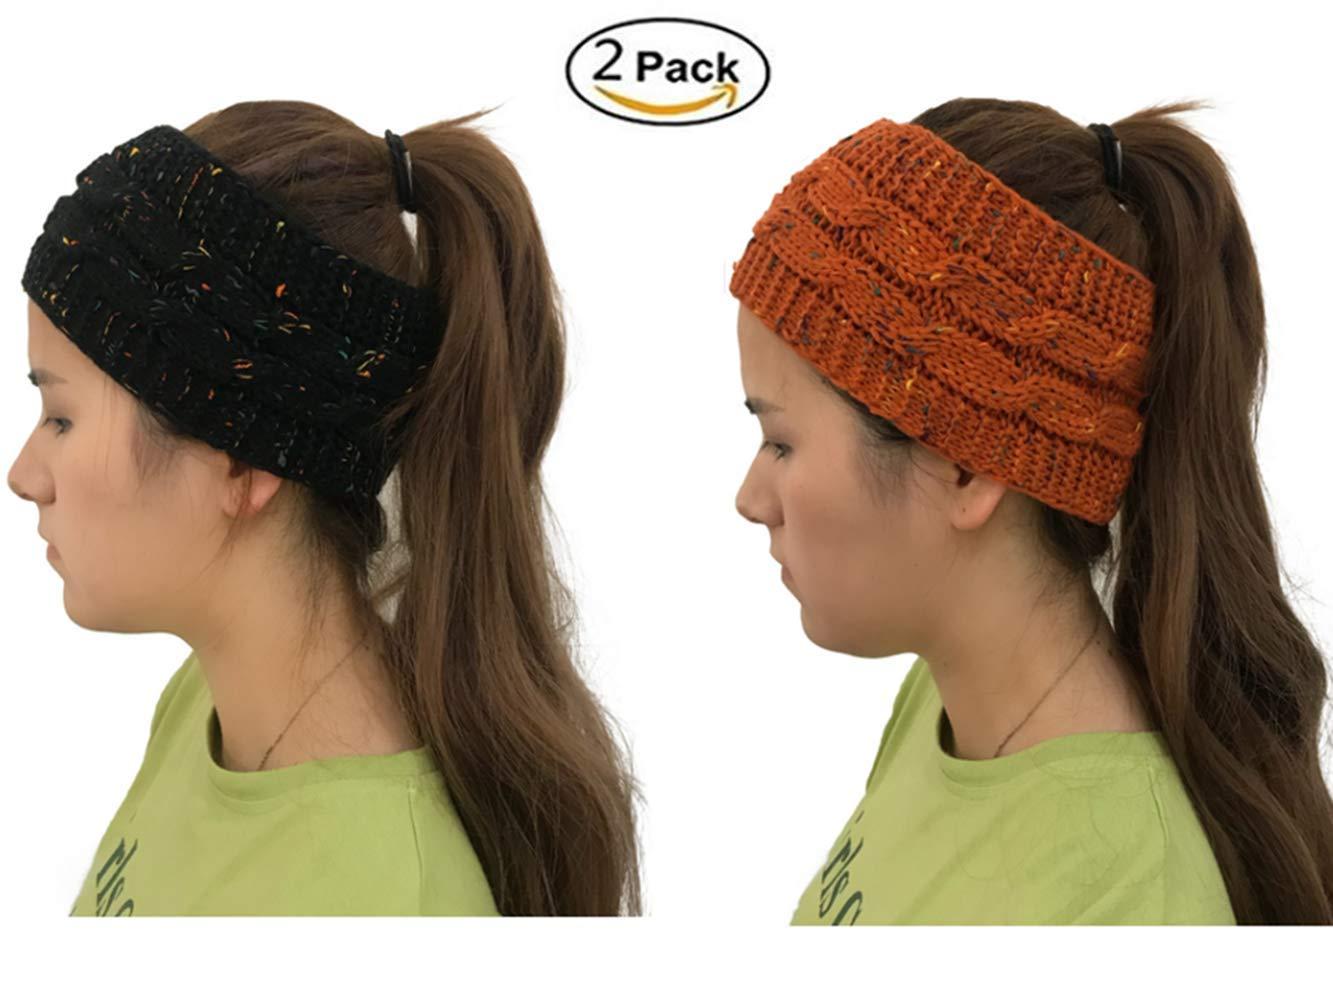 Nhmpretty 2 pack Womens Winter Knit Headband Hairband Hat Cap Ear Warmer (black+brown)